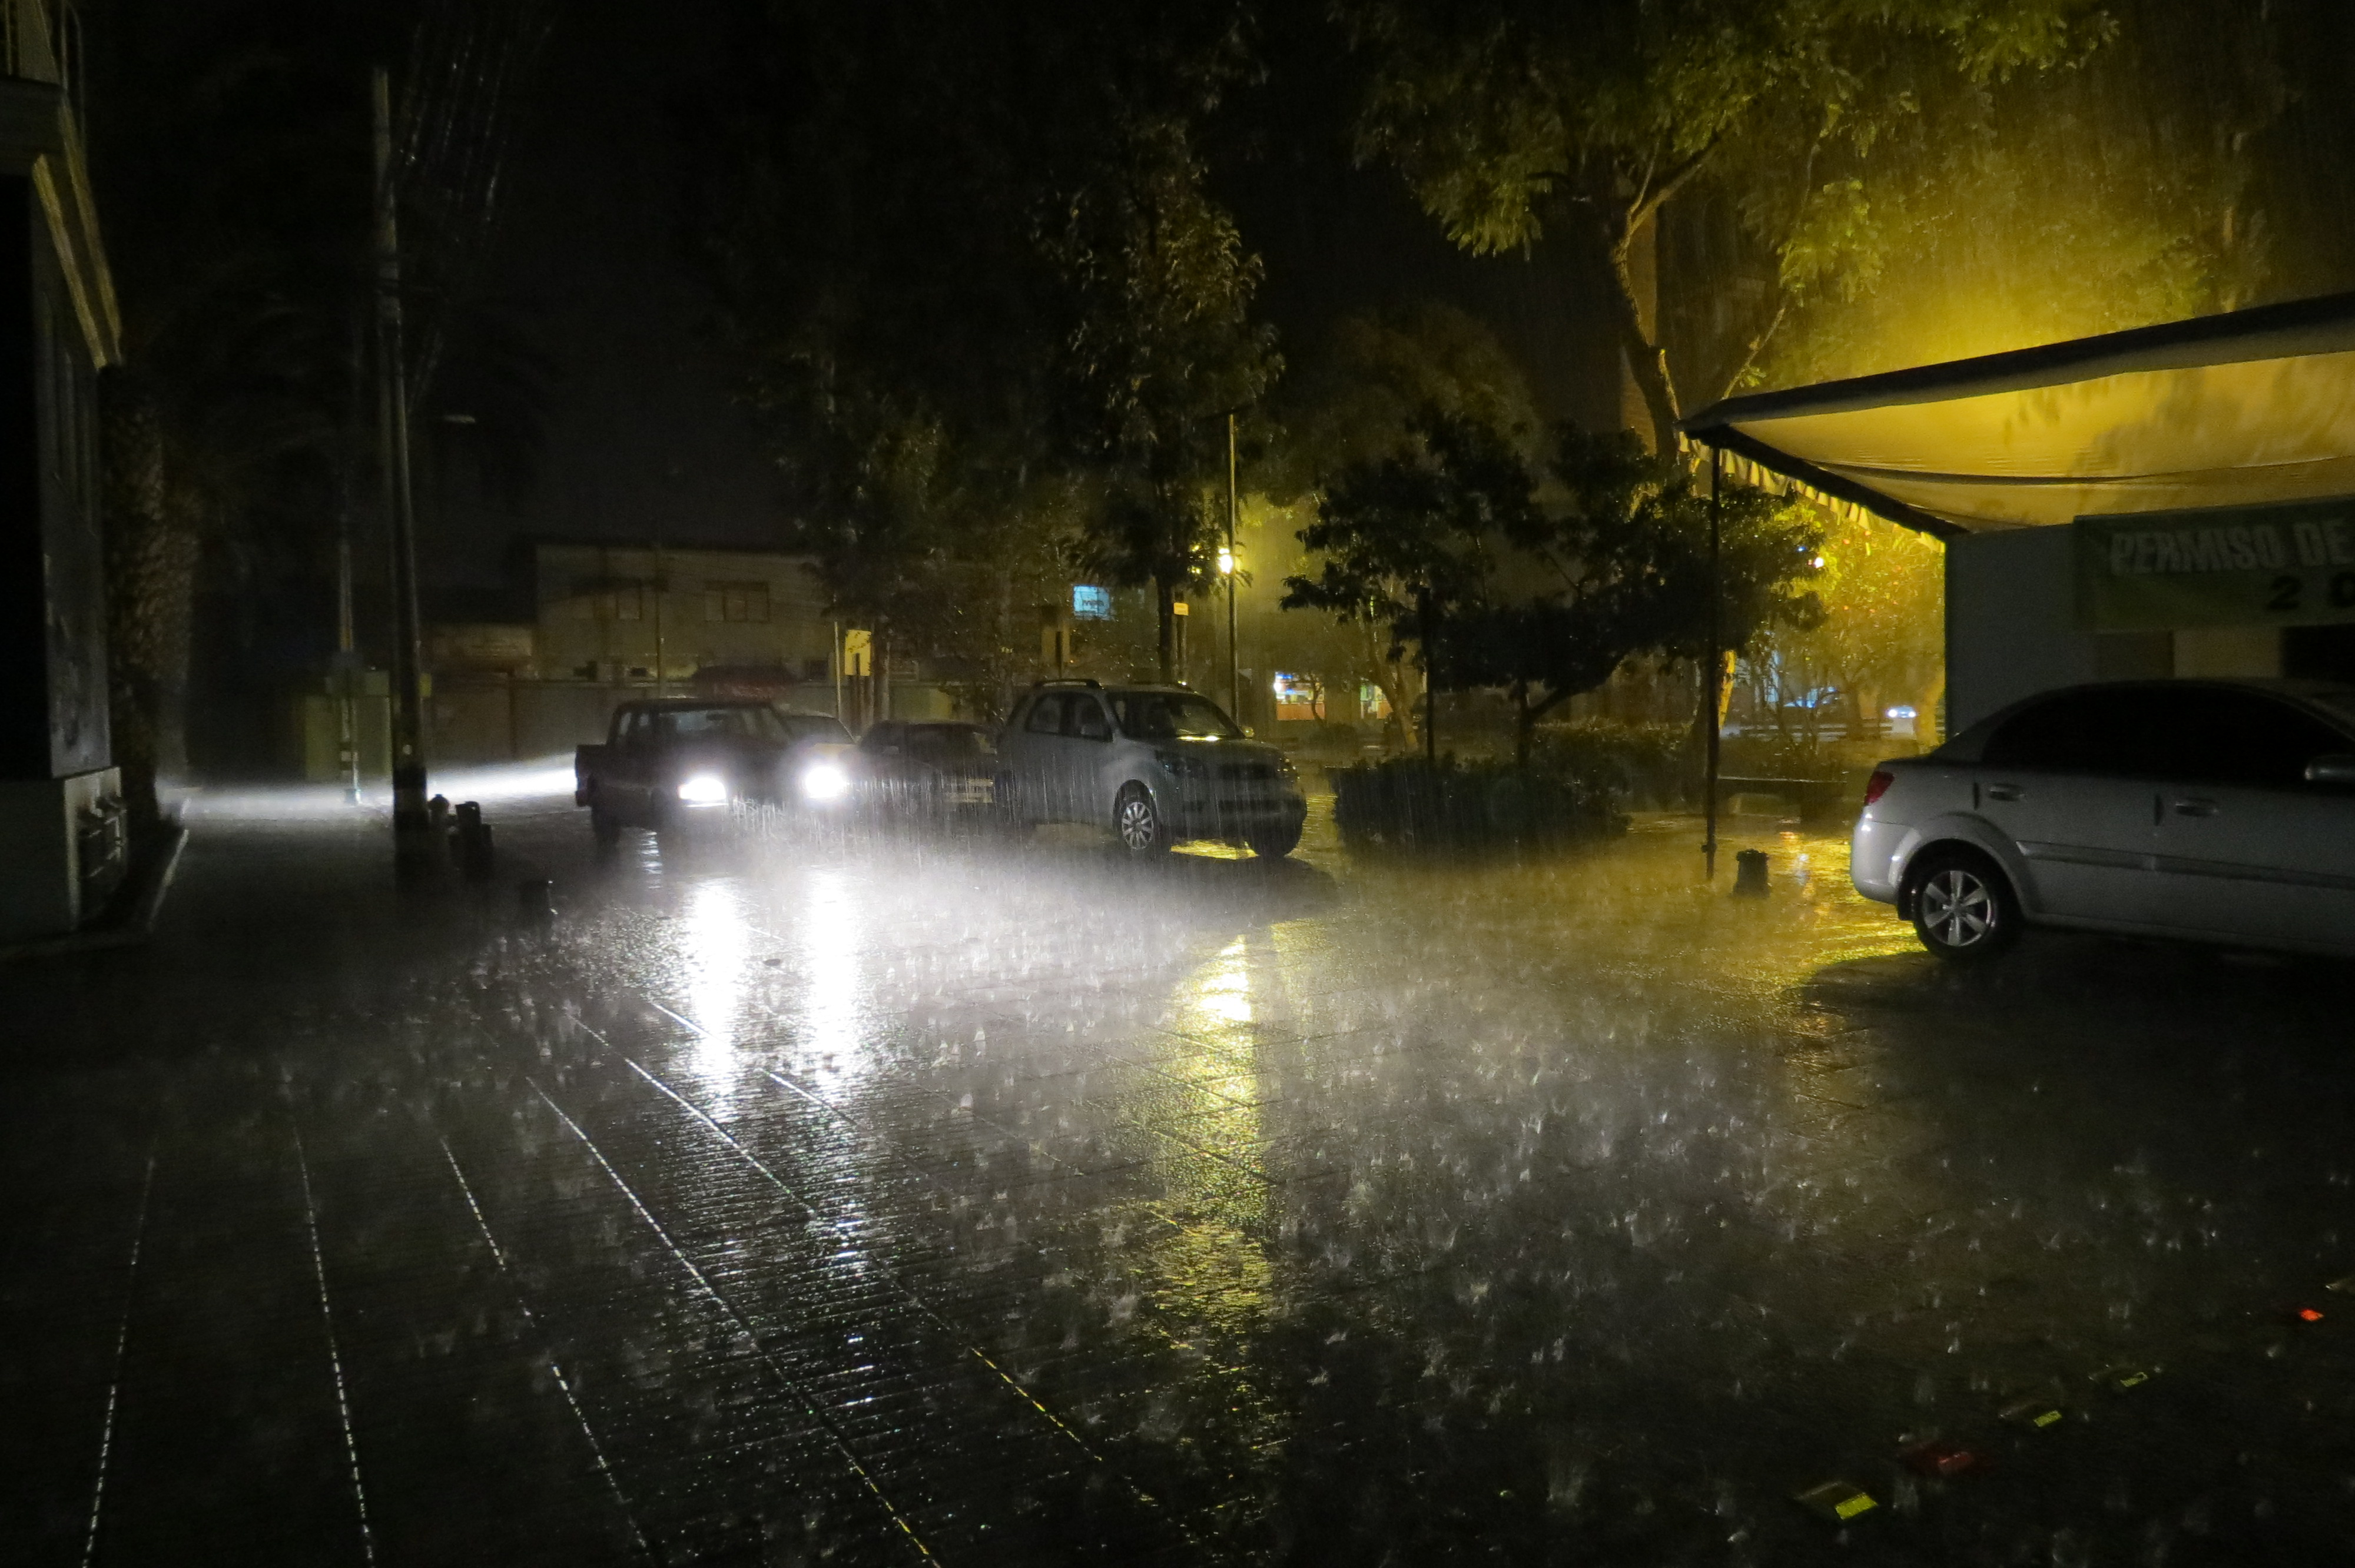 Para este domingo se espera llegada de lluvias al Huasco